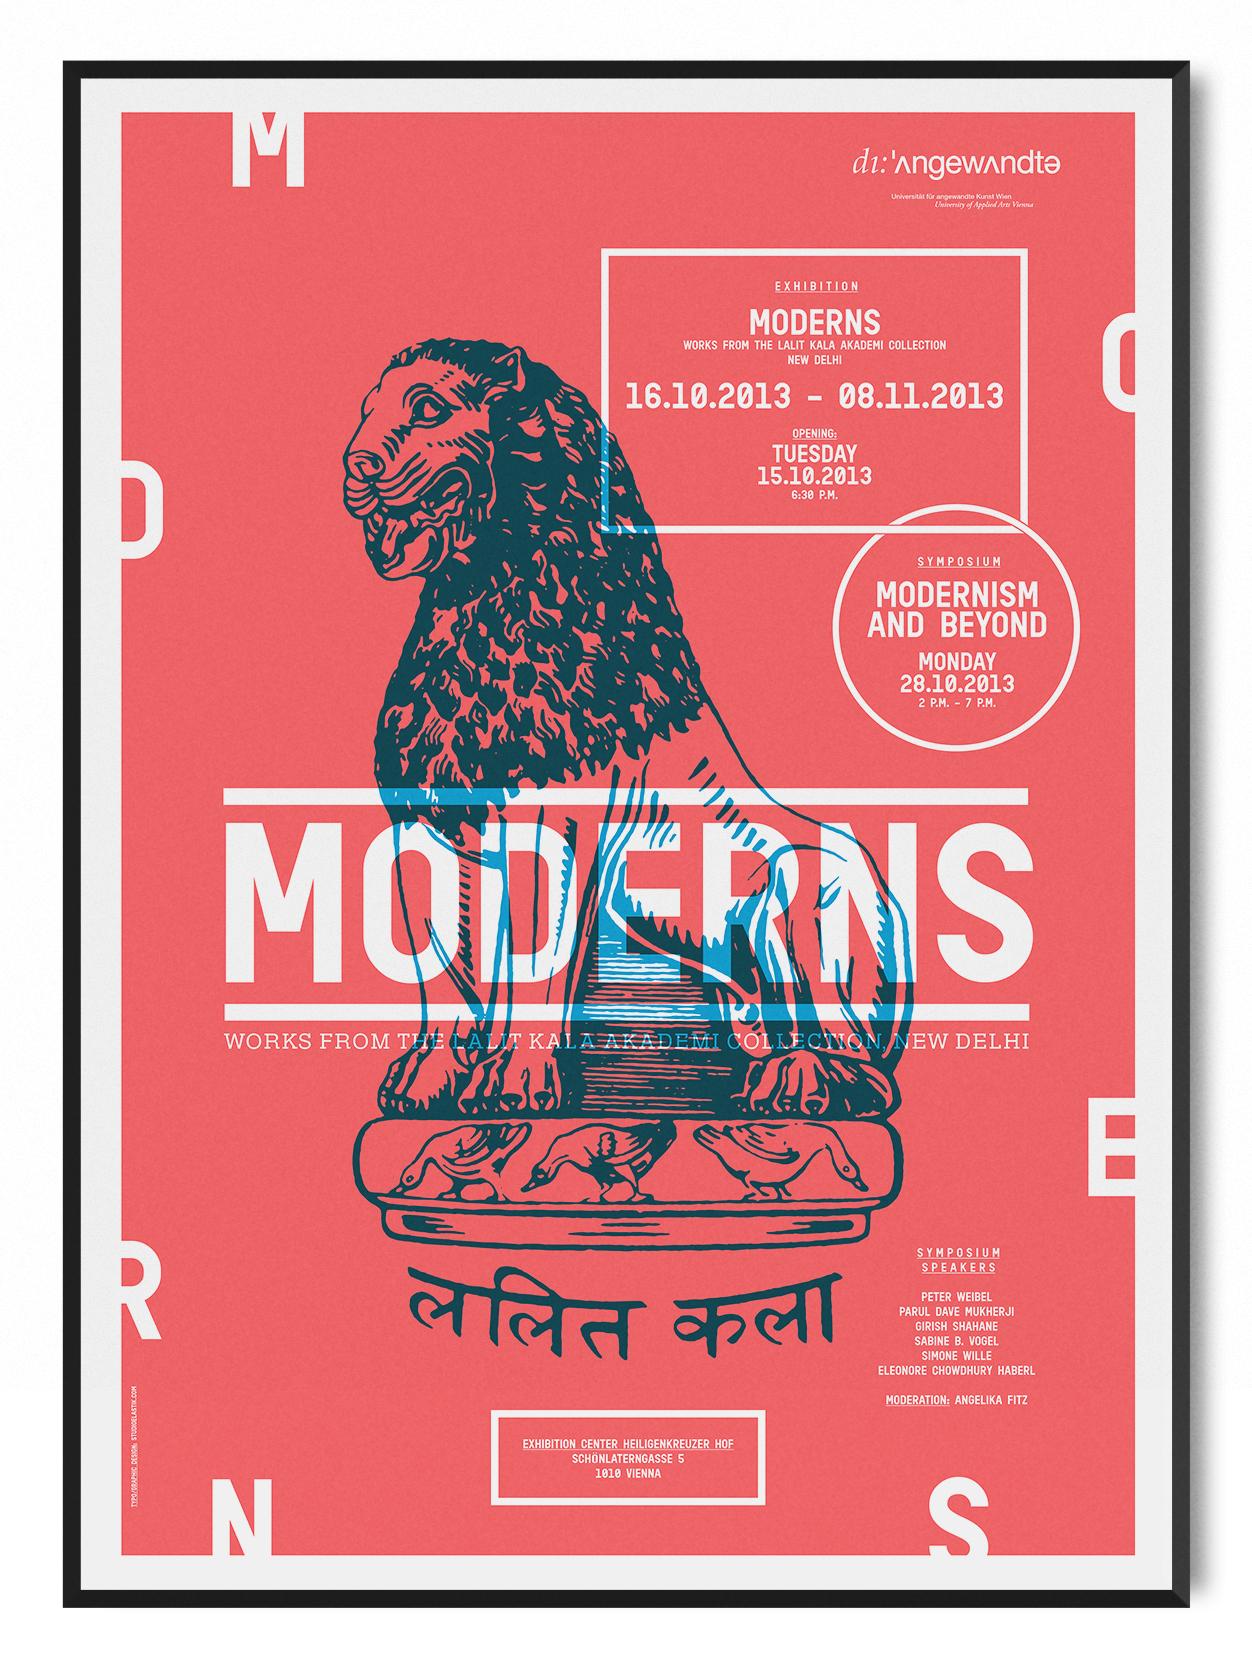 moderns_poster2.jpg